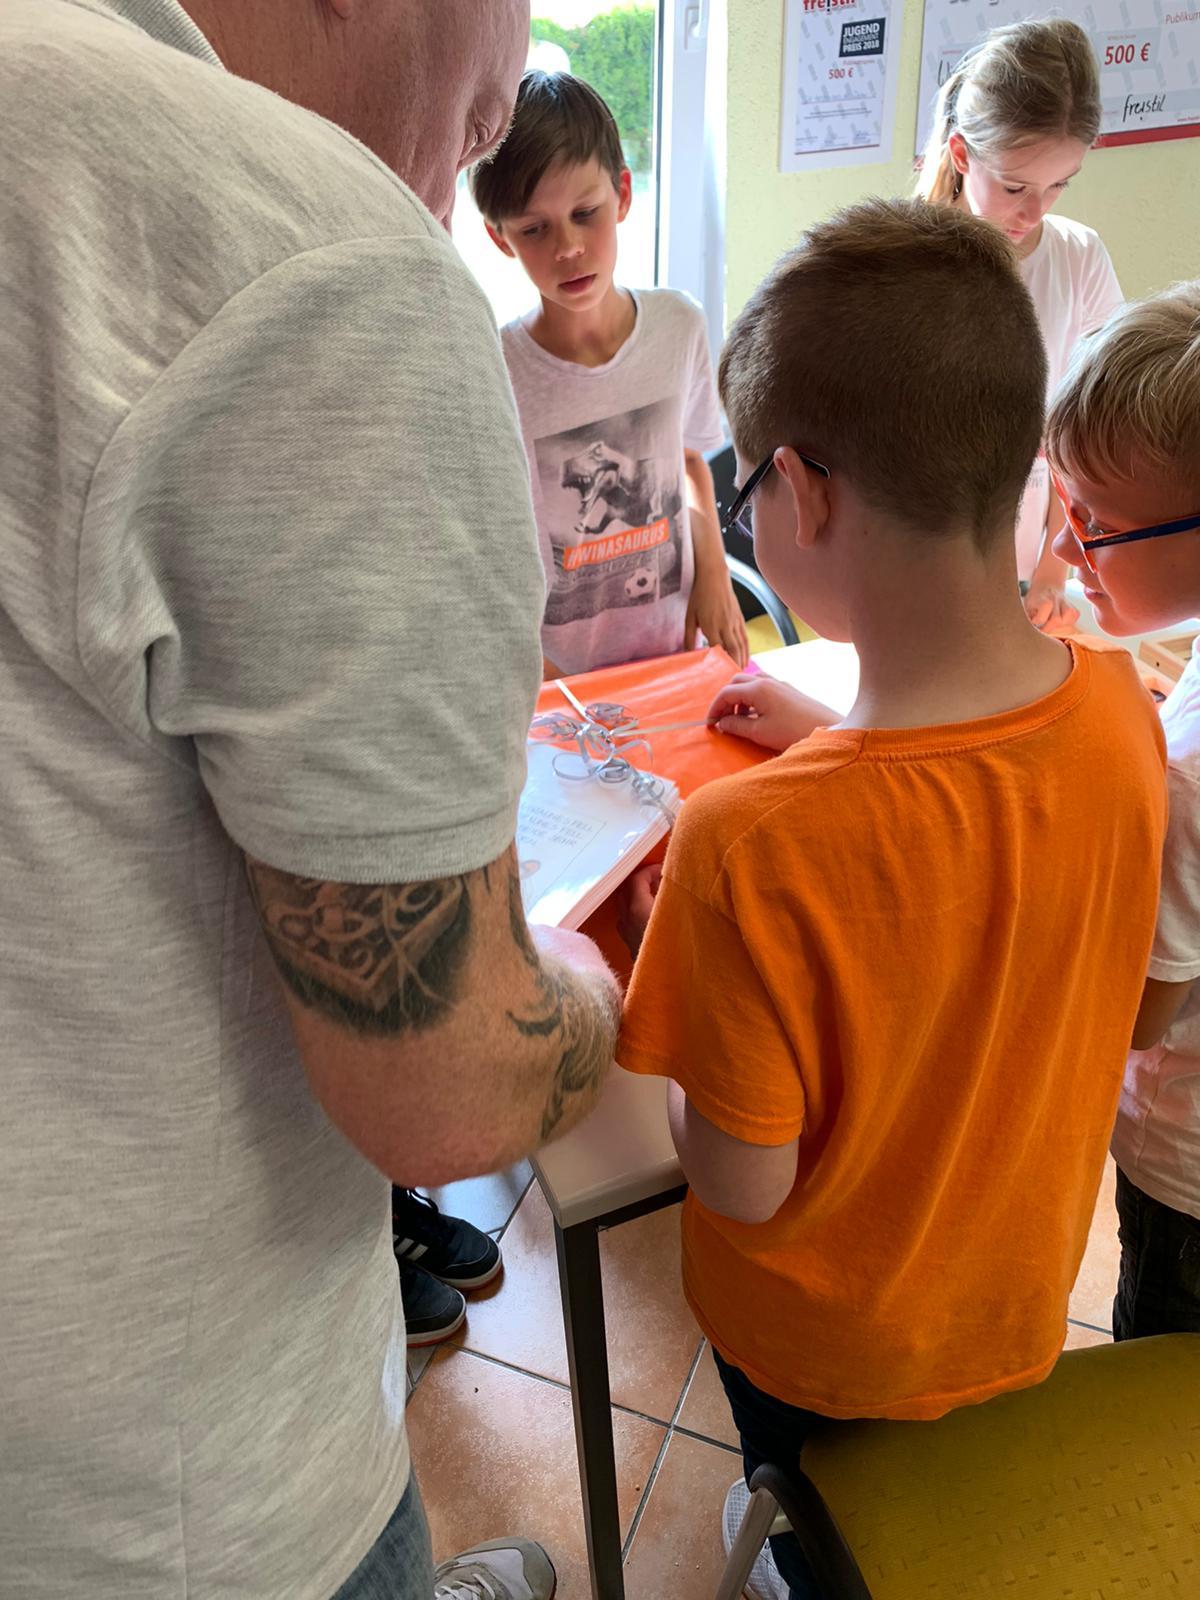 Kindertag im Jugendclub Elster (Elbe)